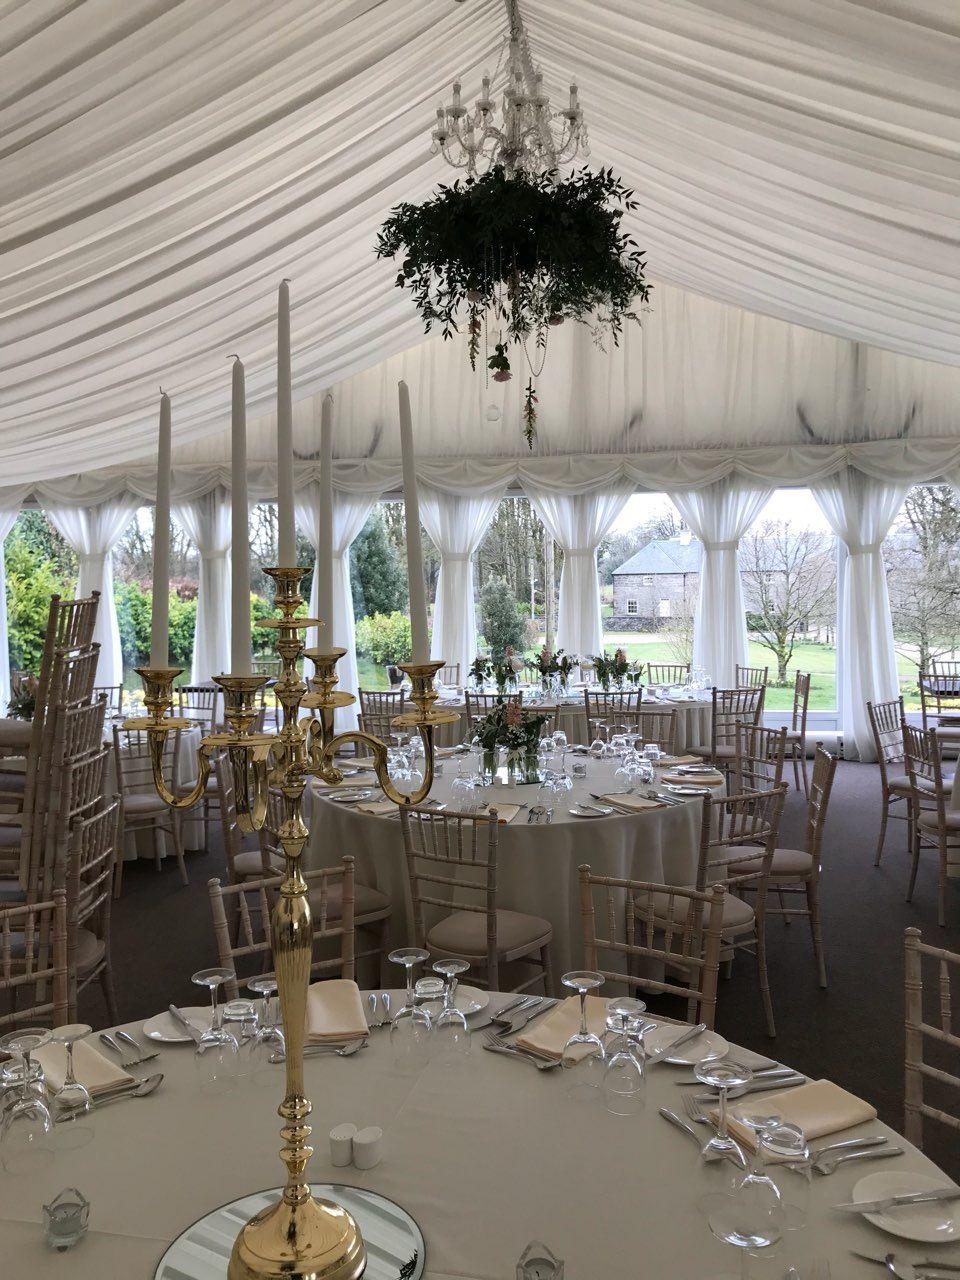 Wedding Reception Golden Candelabra Arrangement Floral